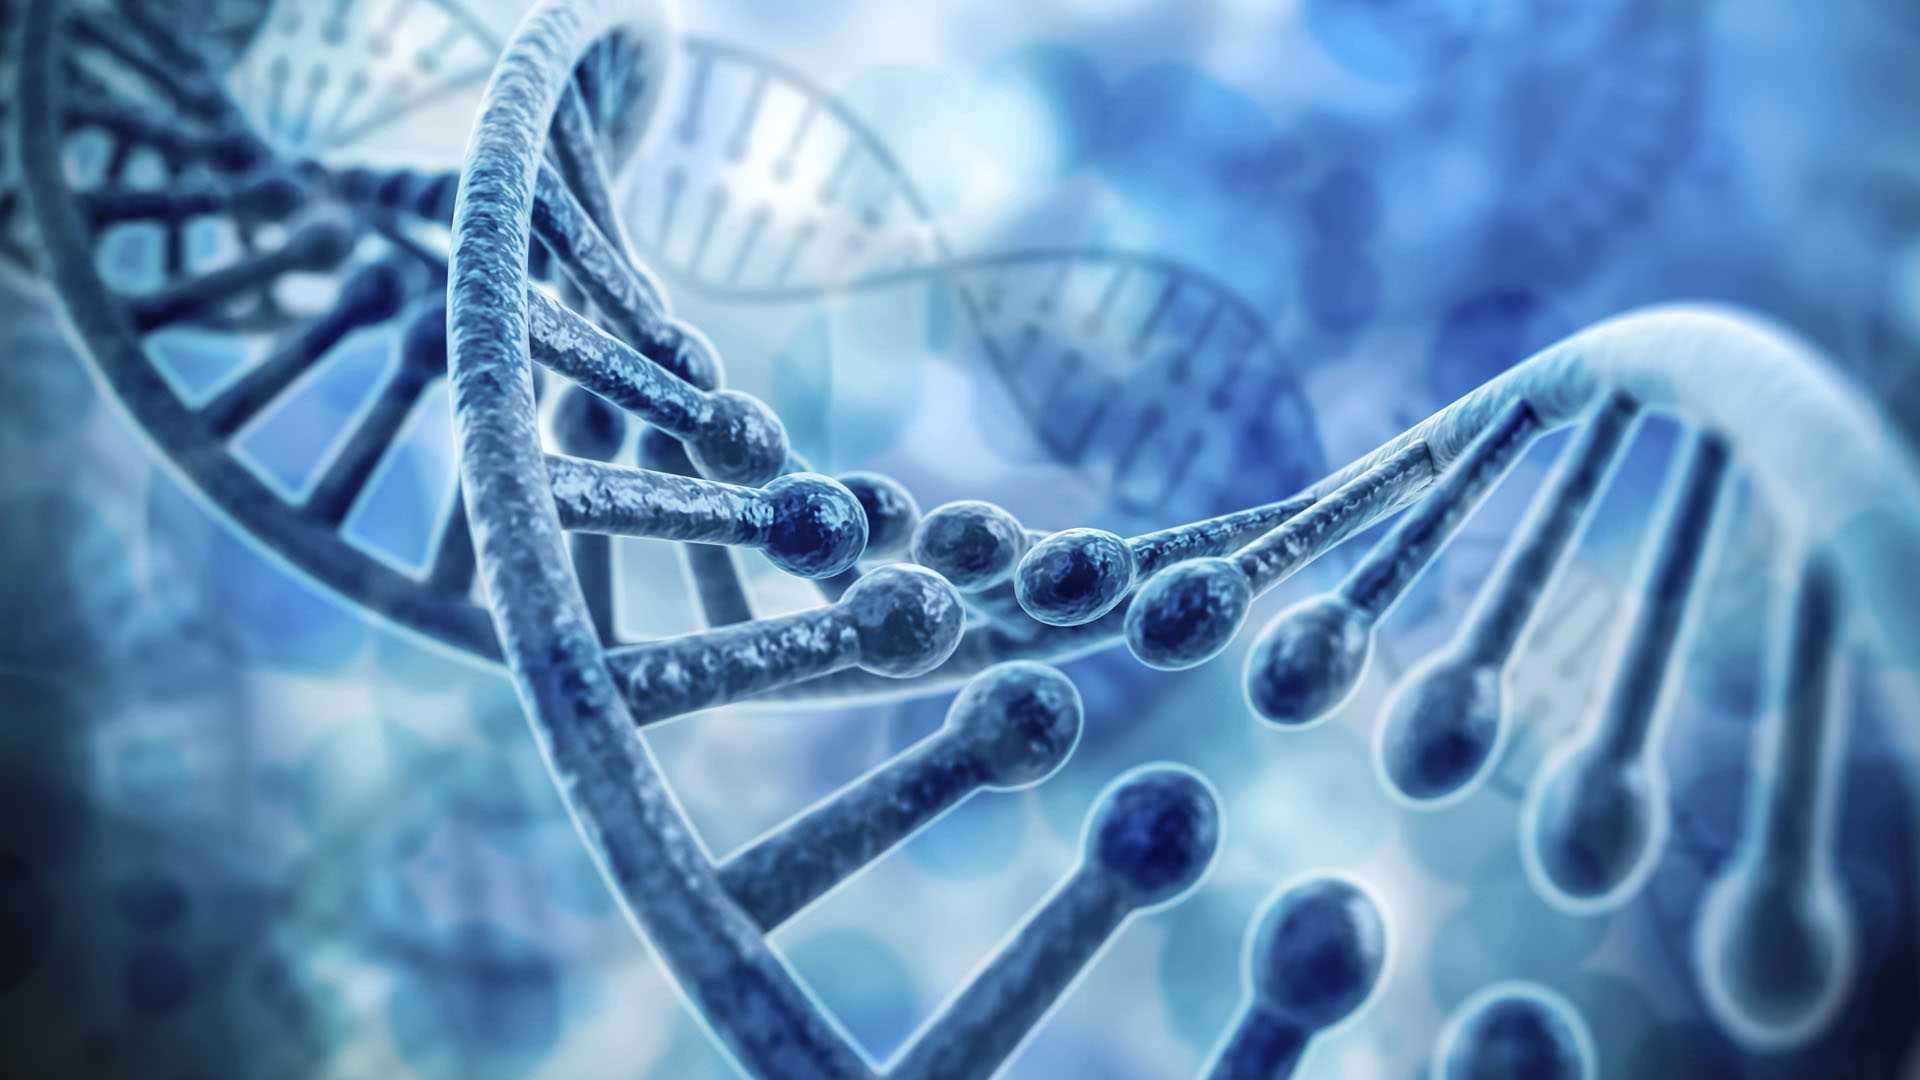 A representation of DNA.